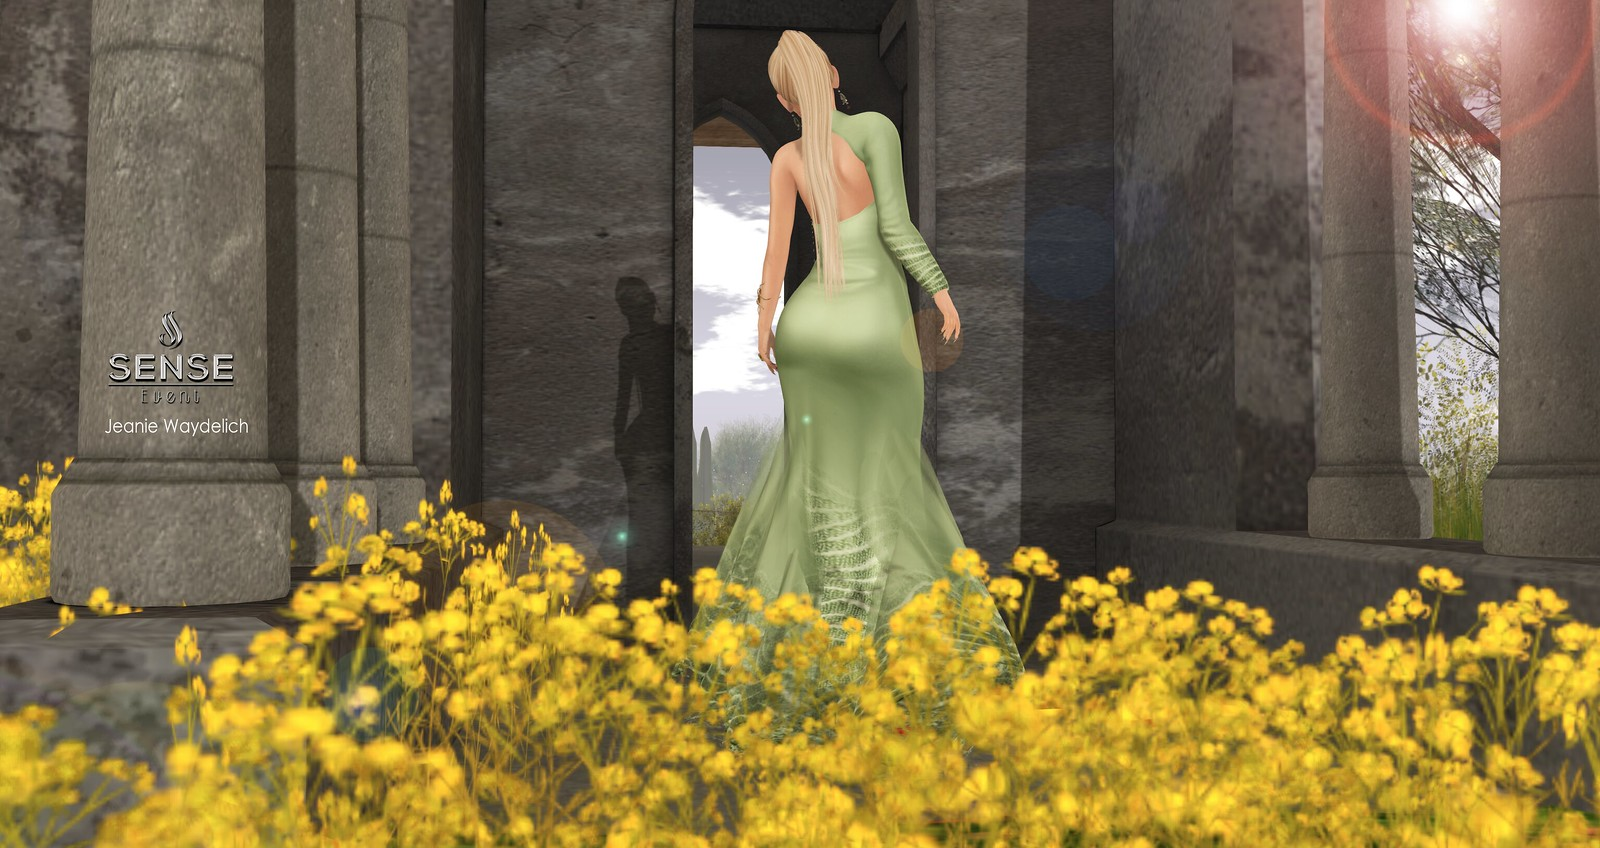 LOTD 949 - Pretty garden